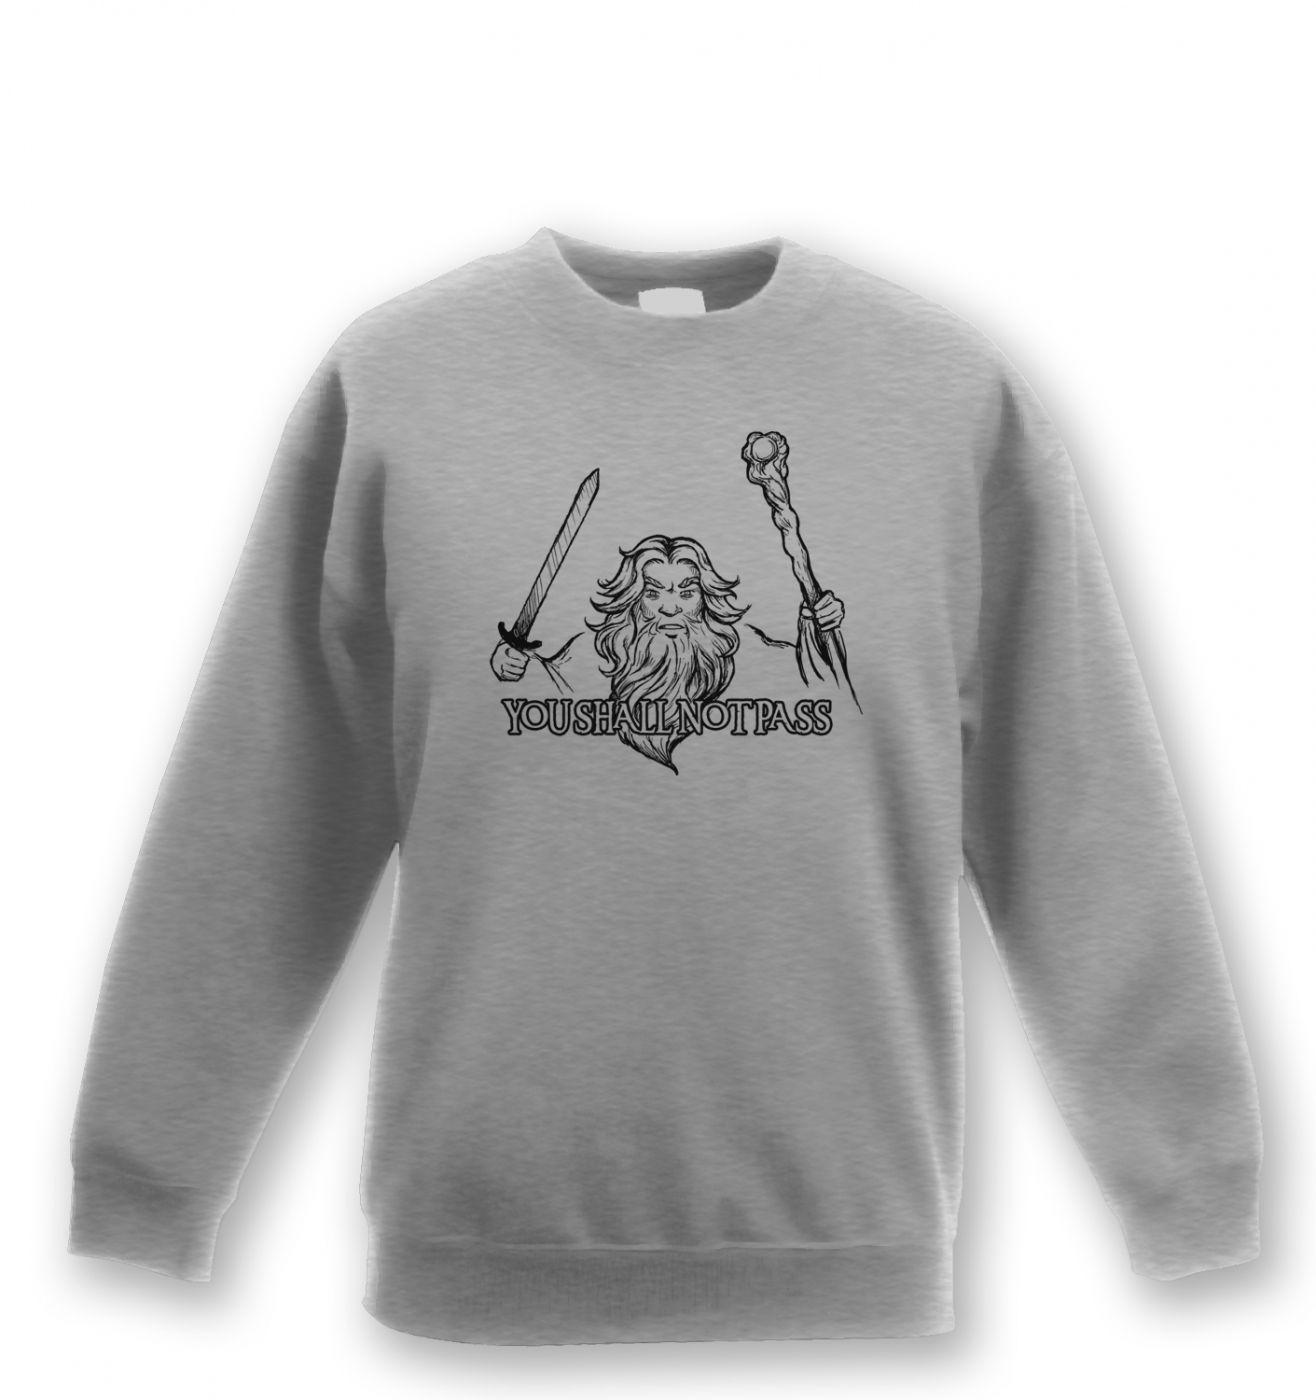 Gandalf You shall not pass unisex kids sweatshirt